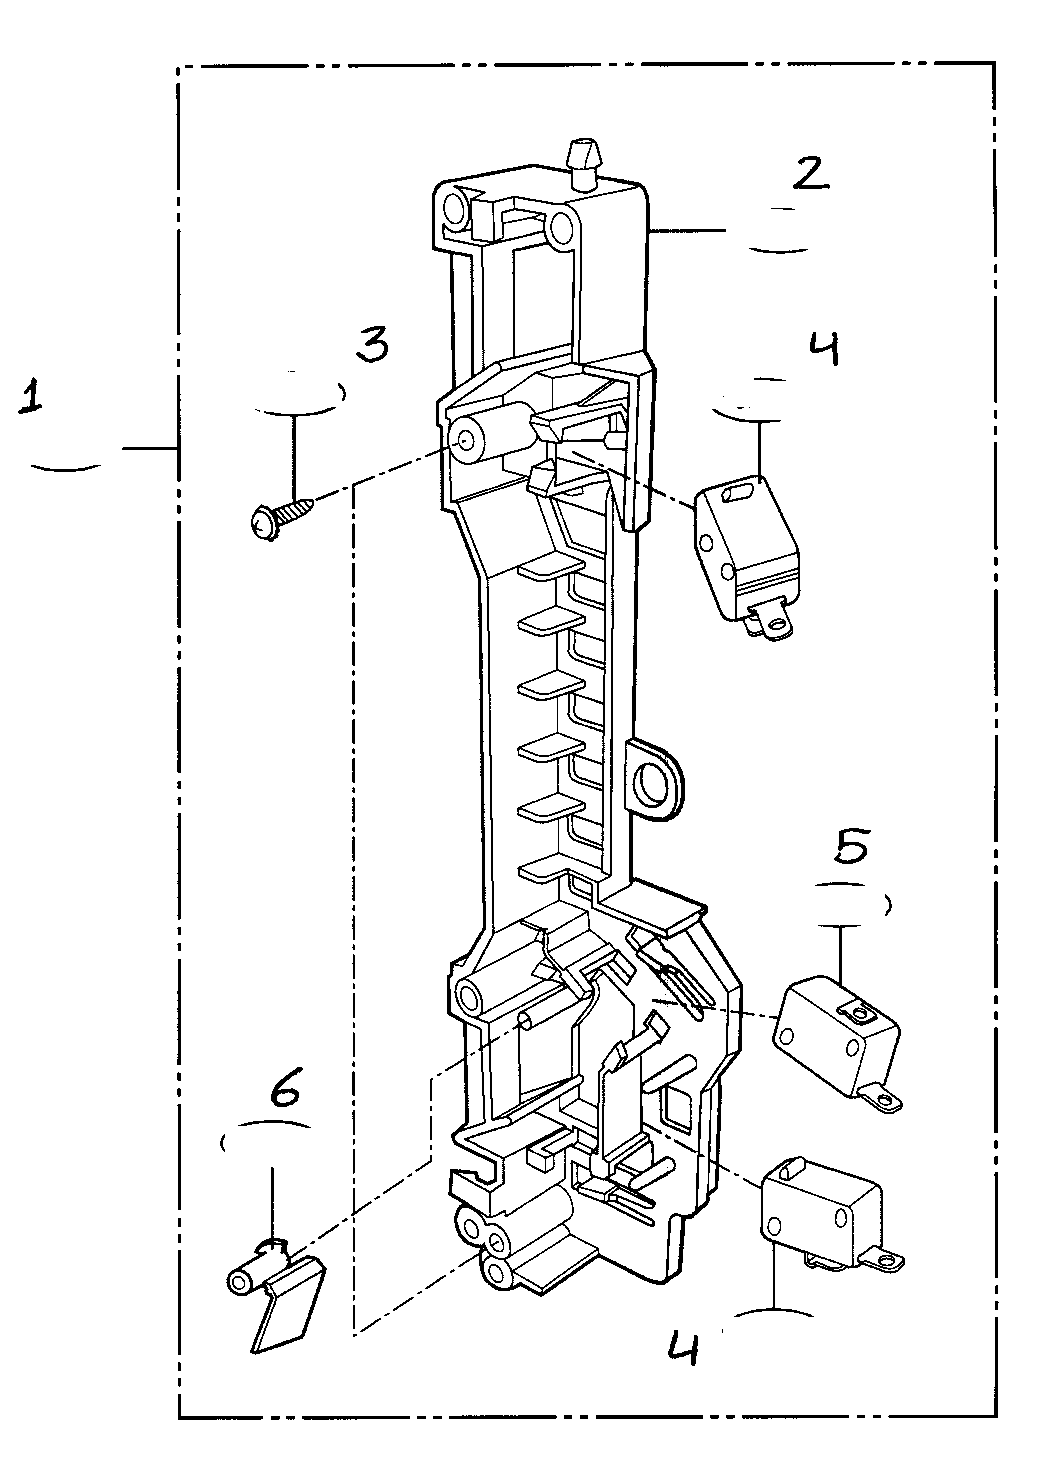 Lg model LMVM2055ST microwave/hood combo genuine parts